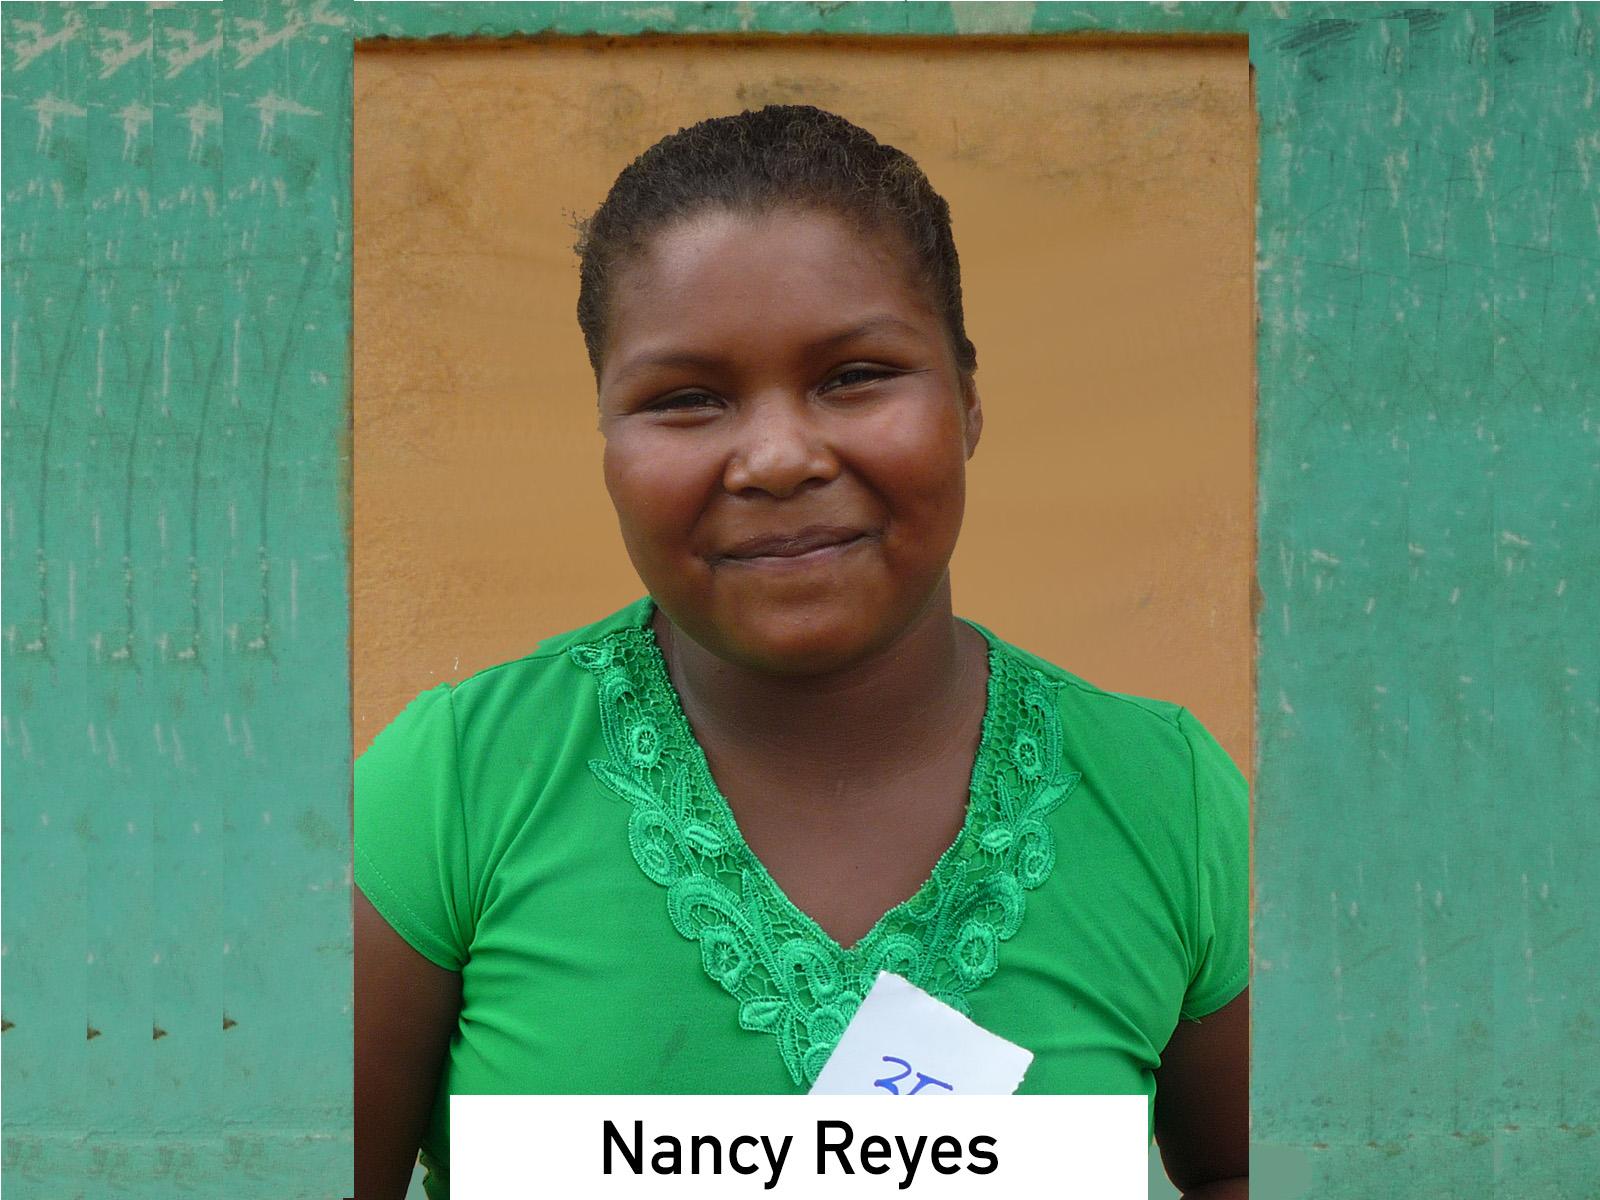 035 - Nancy Reyes.jpg